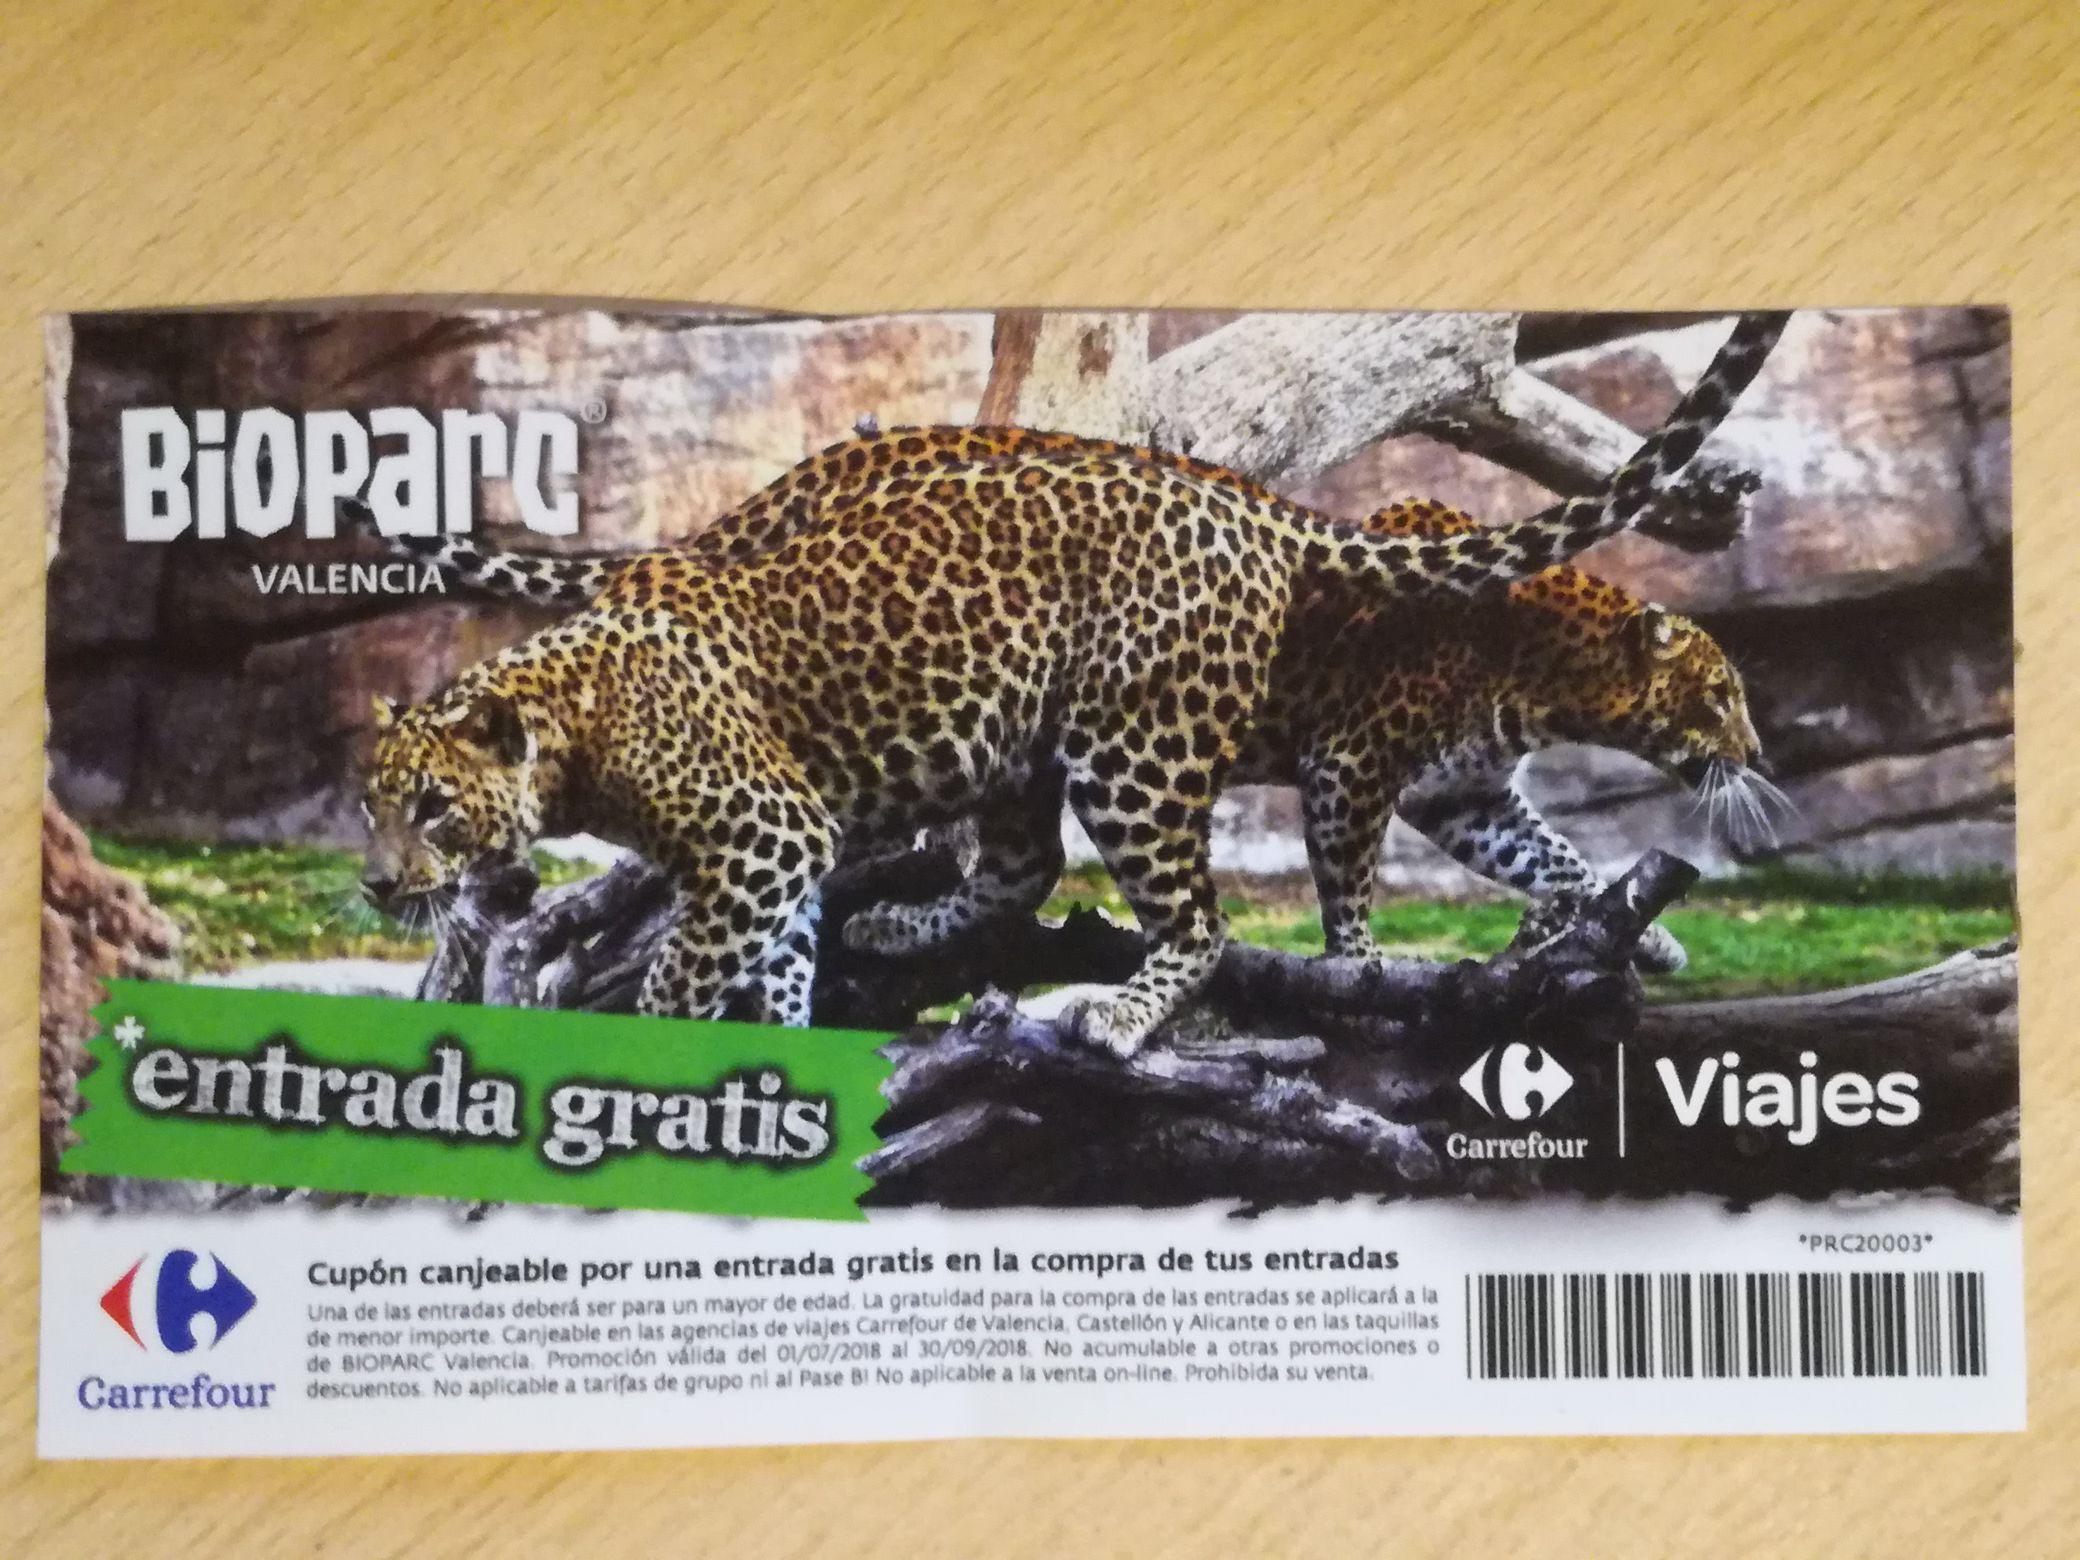 Entrada gratis 2x1 Bioparc (Valencia)